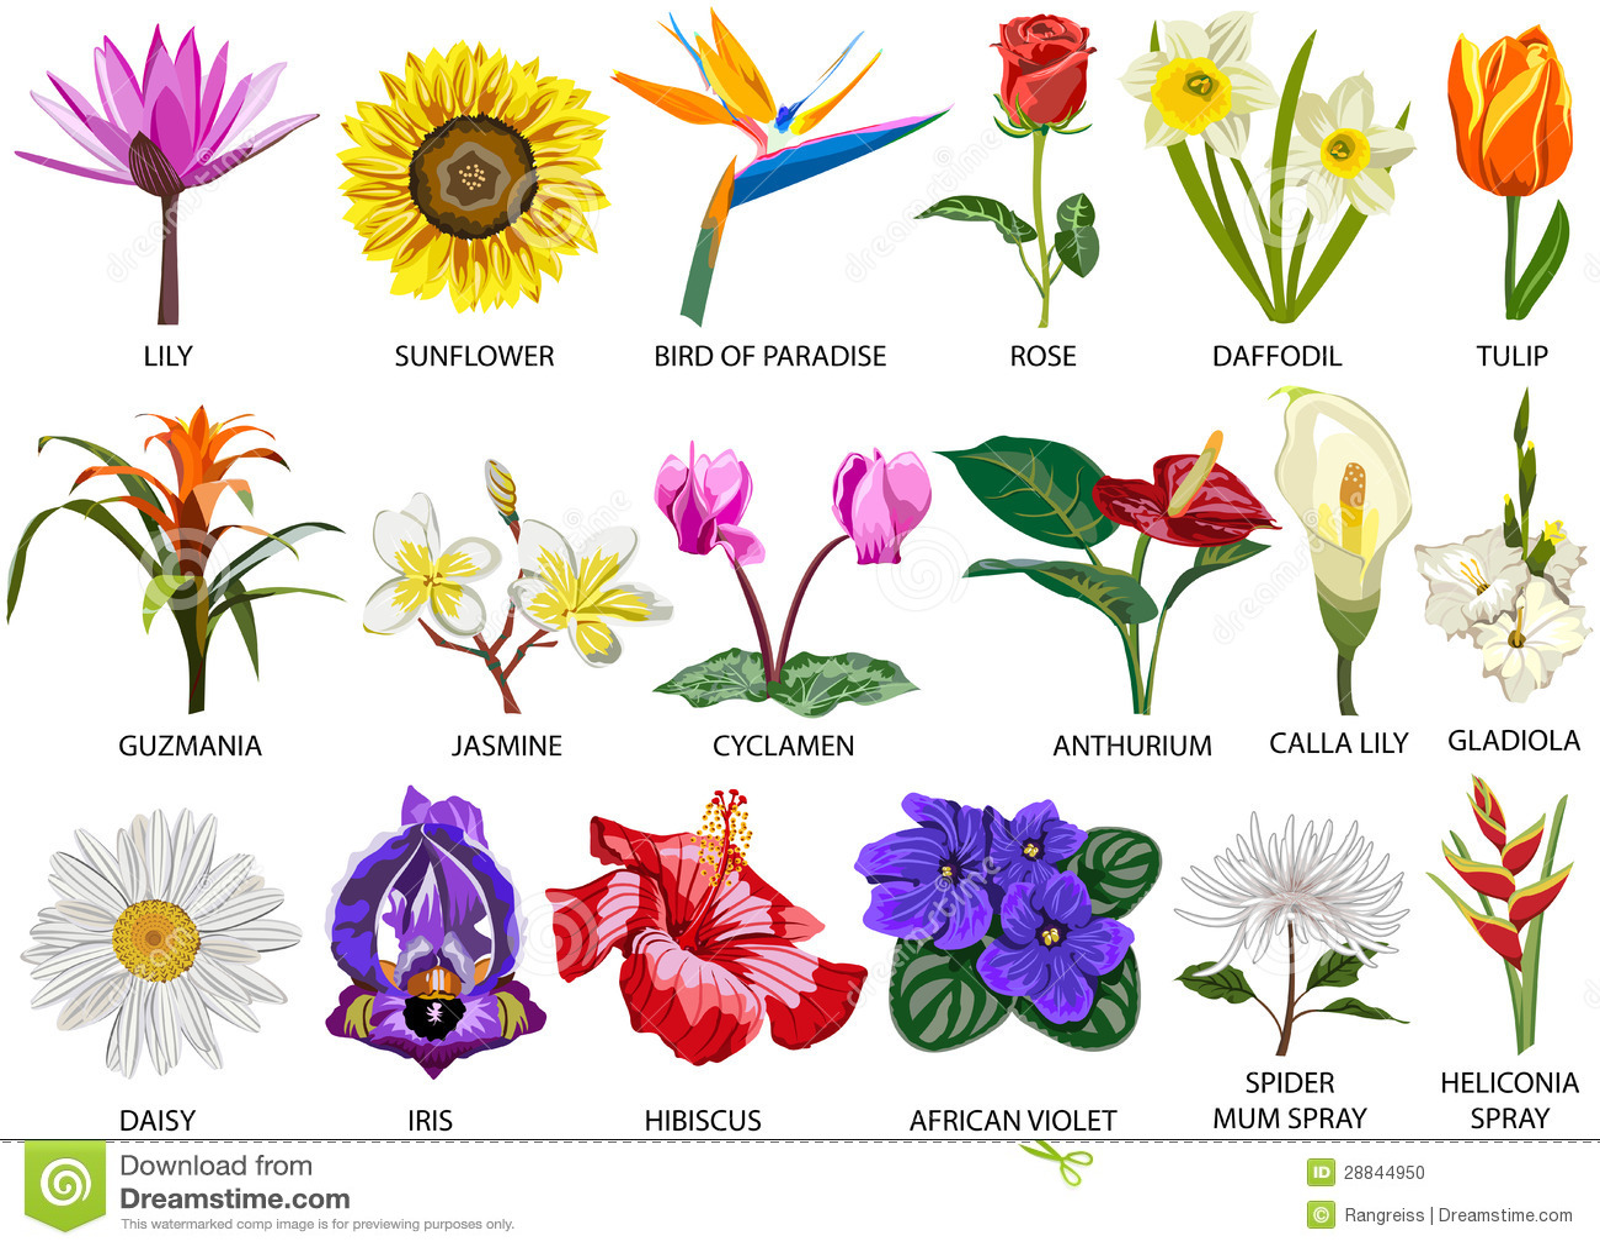 18 species of colorful flowers stock photo image 28844950 for Nombres de arboles en ingles